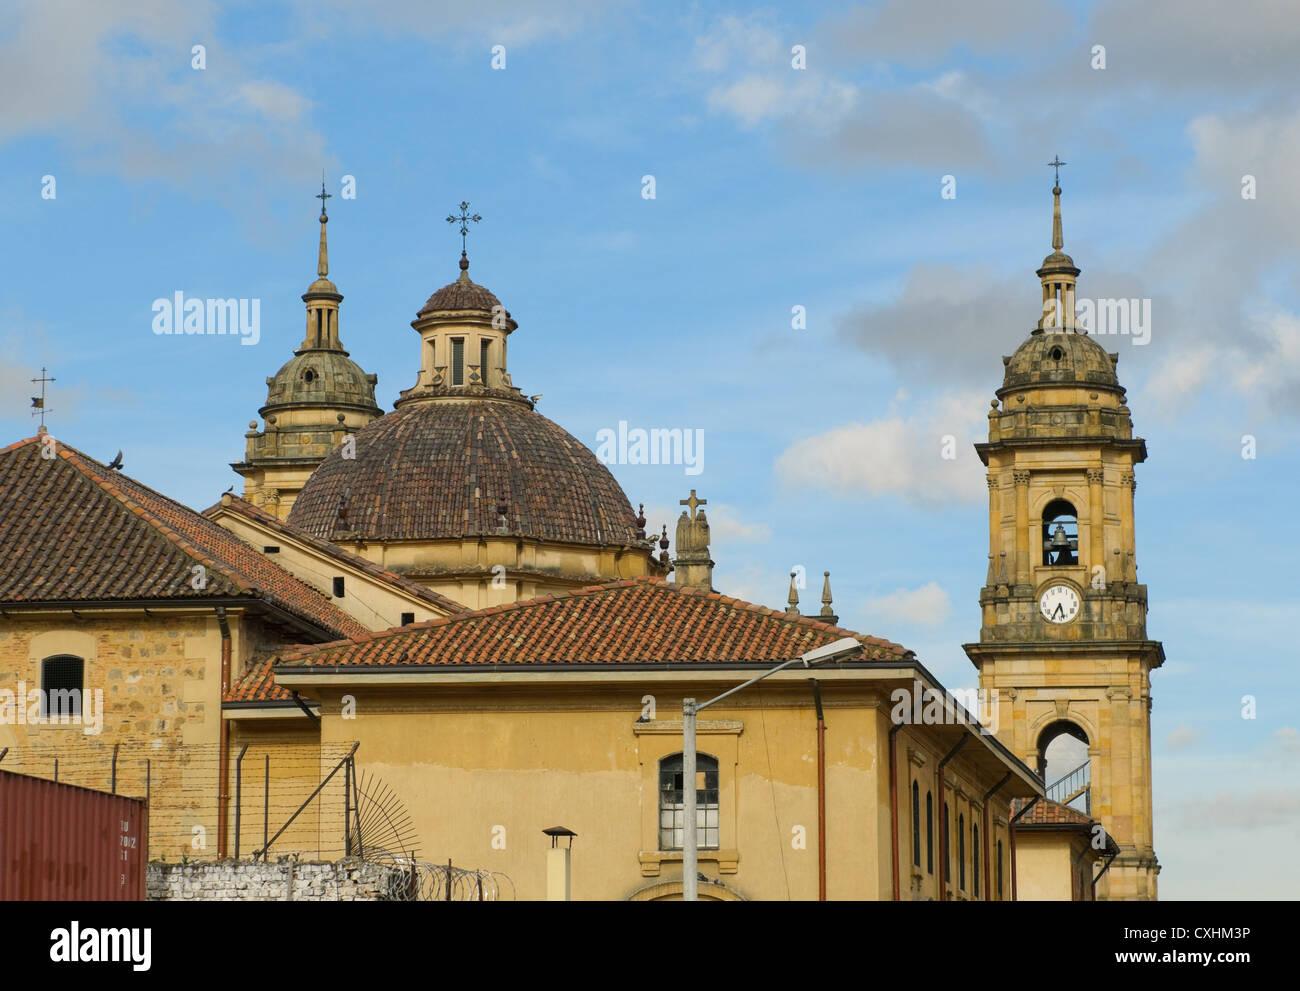 Cathédrale de primates, Bogota, Colombie Photo Stock